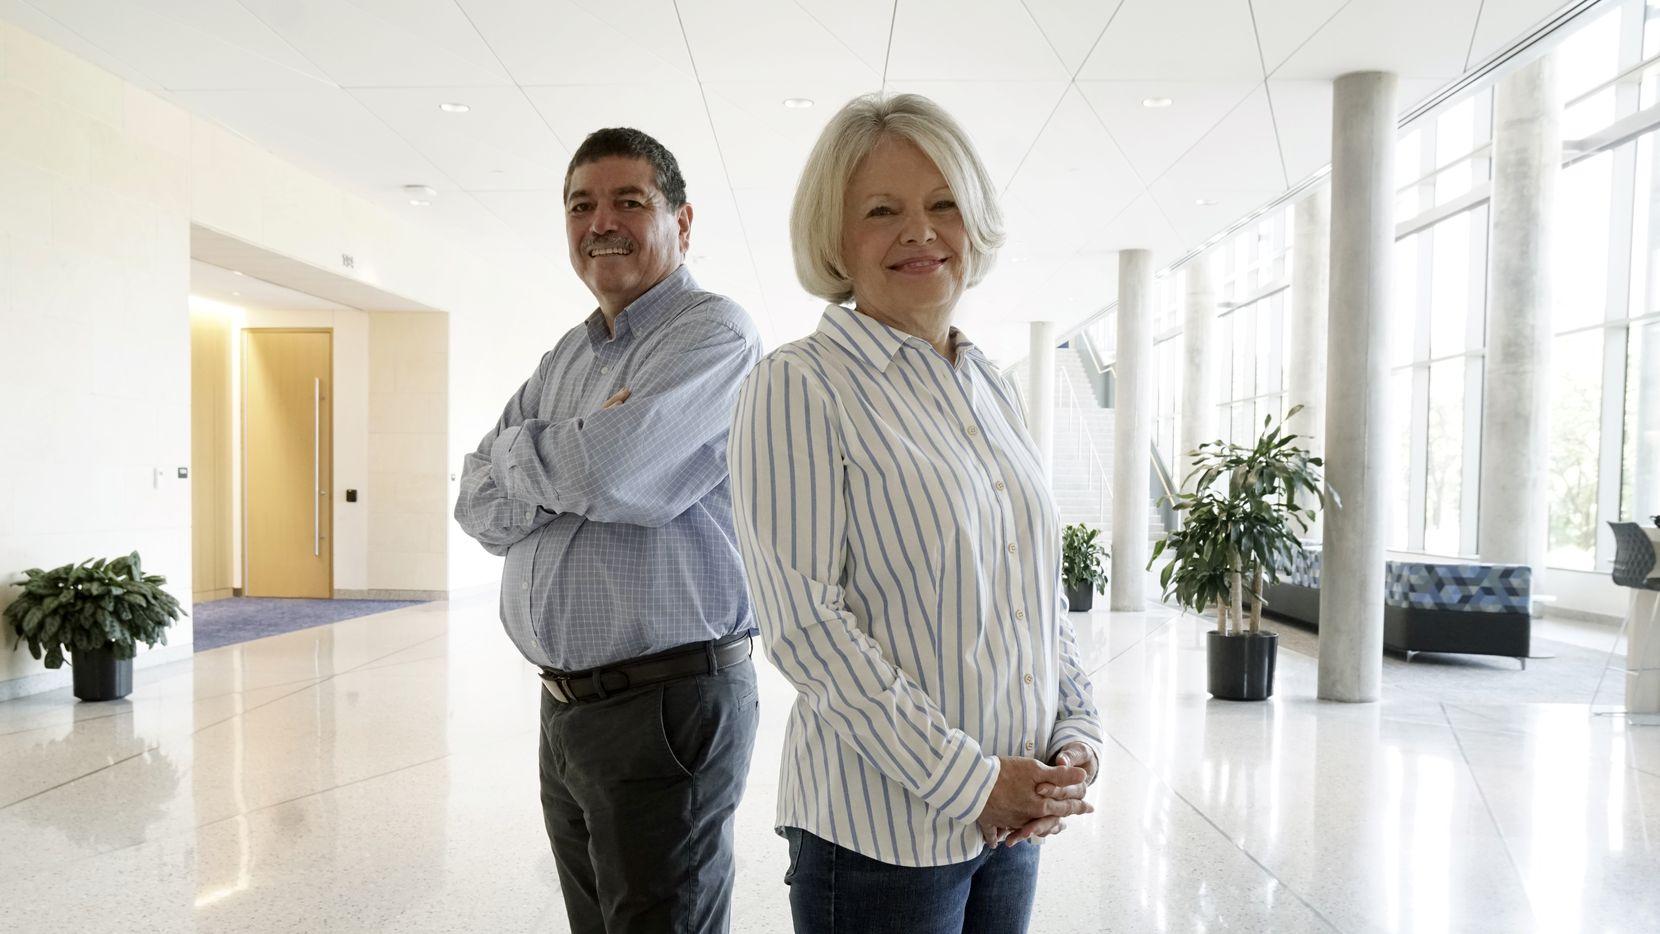 Quantum For All leaders Karen Jo Matsler and Ramón López on the UTA campus in Arlington on June 11, 2021.